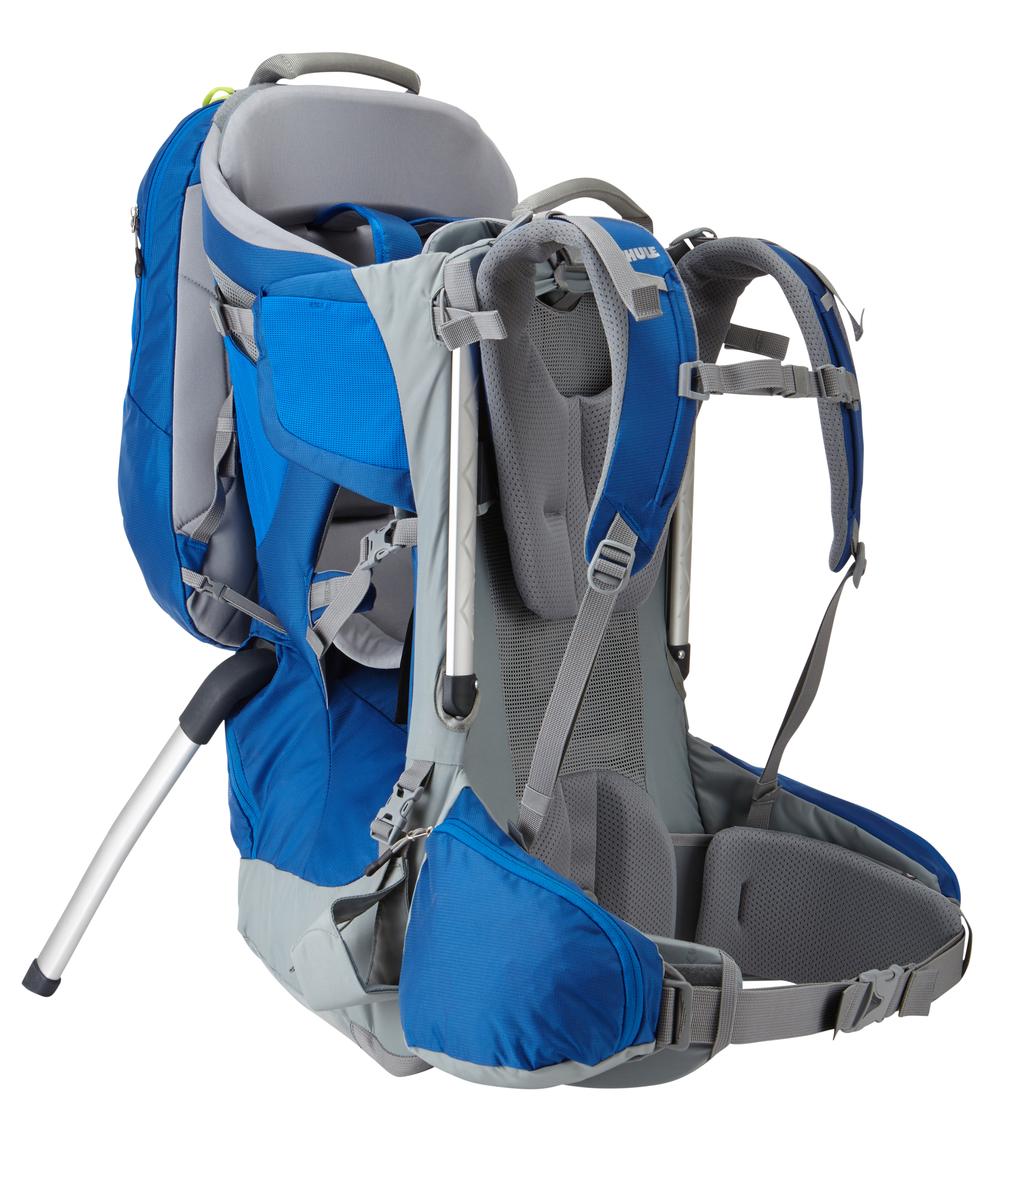 Рюкзак для переноски детей Thule